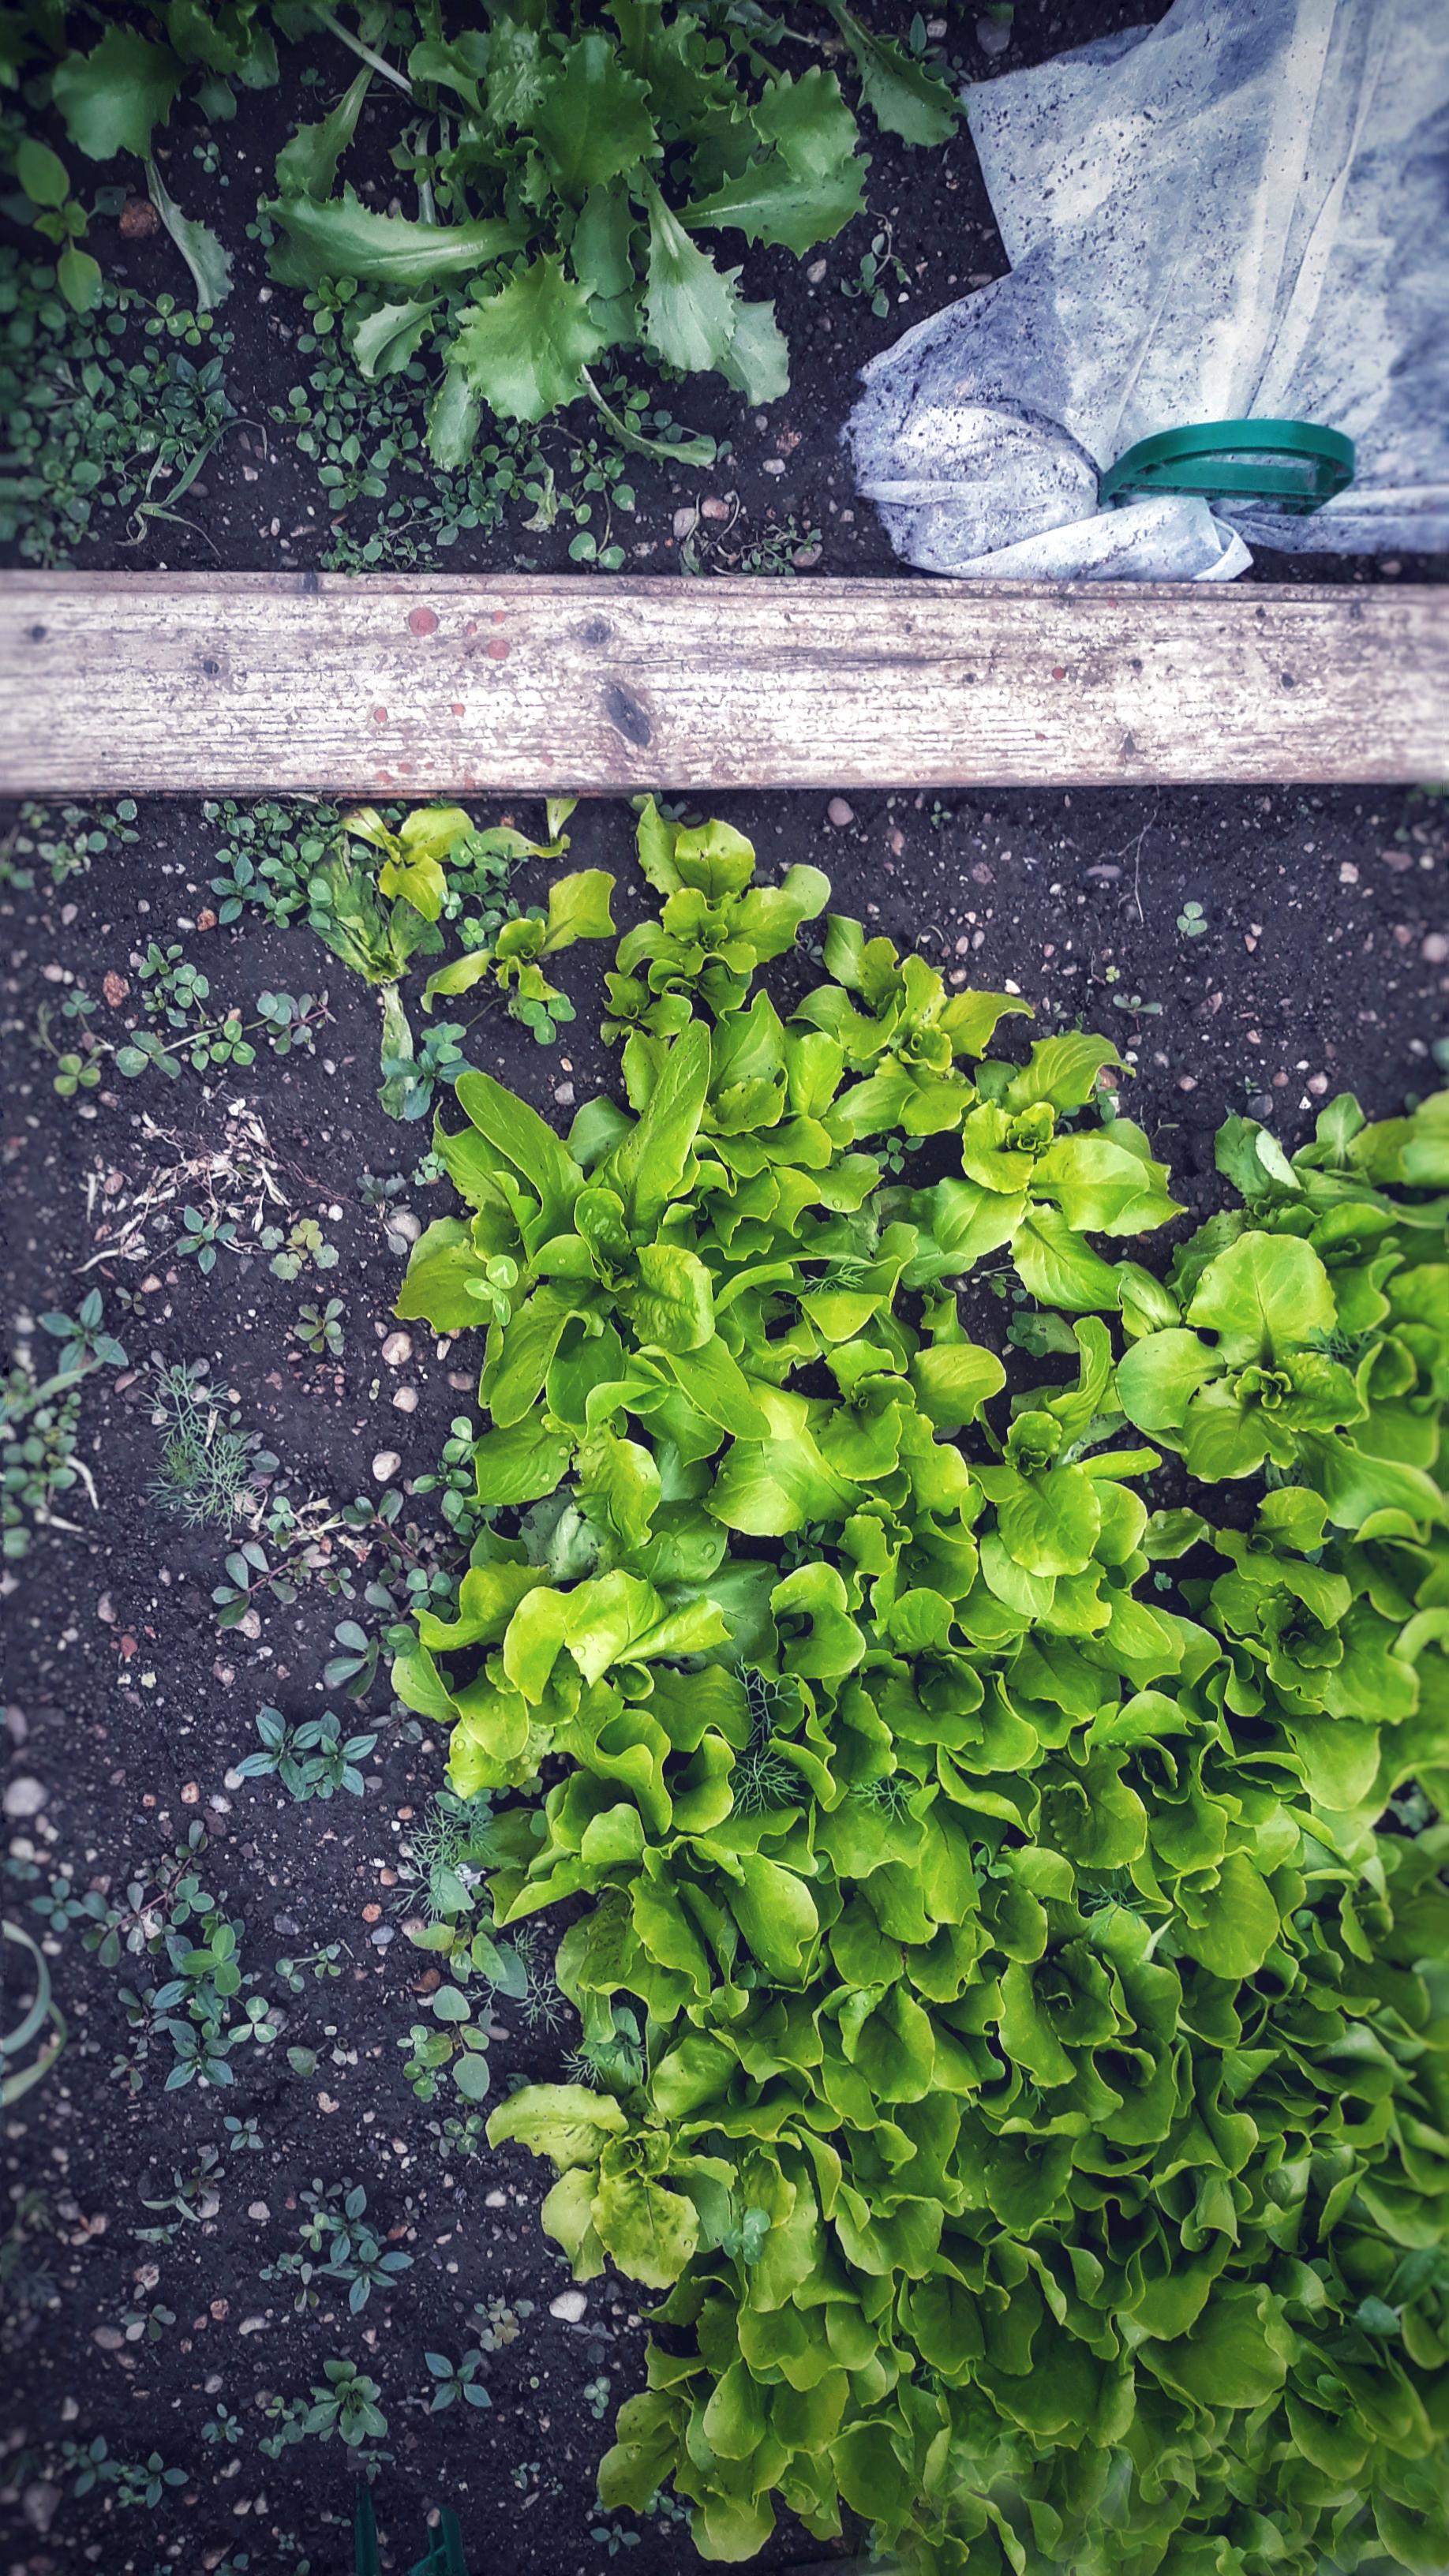 mama's garden, gardening, earth, salad, mother earth,